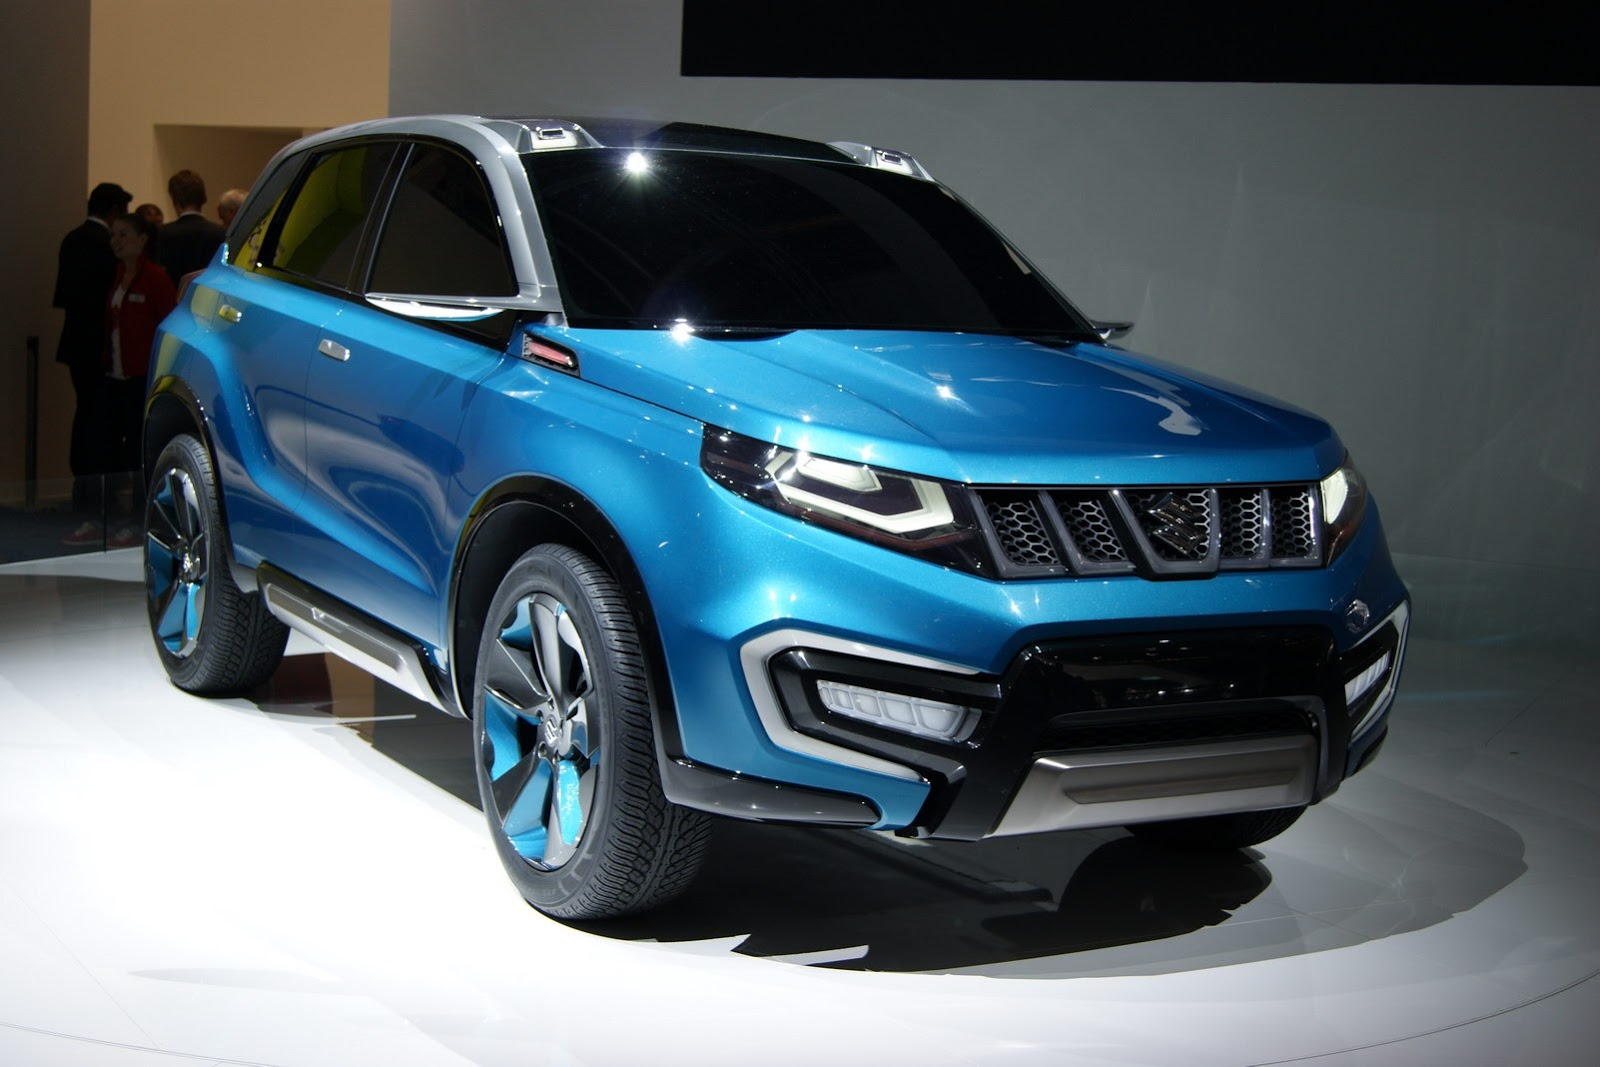 Next Generation Suzuki Vitara Set to Debut in October 2020 1